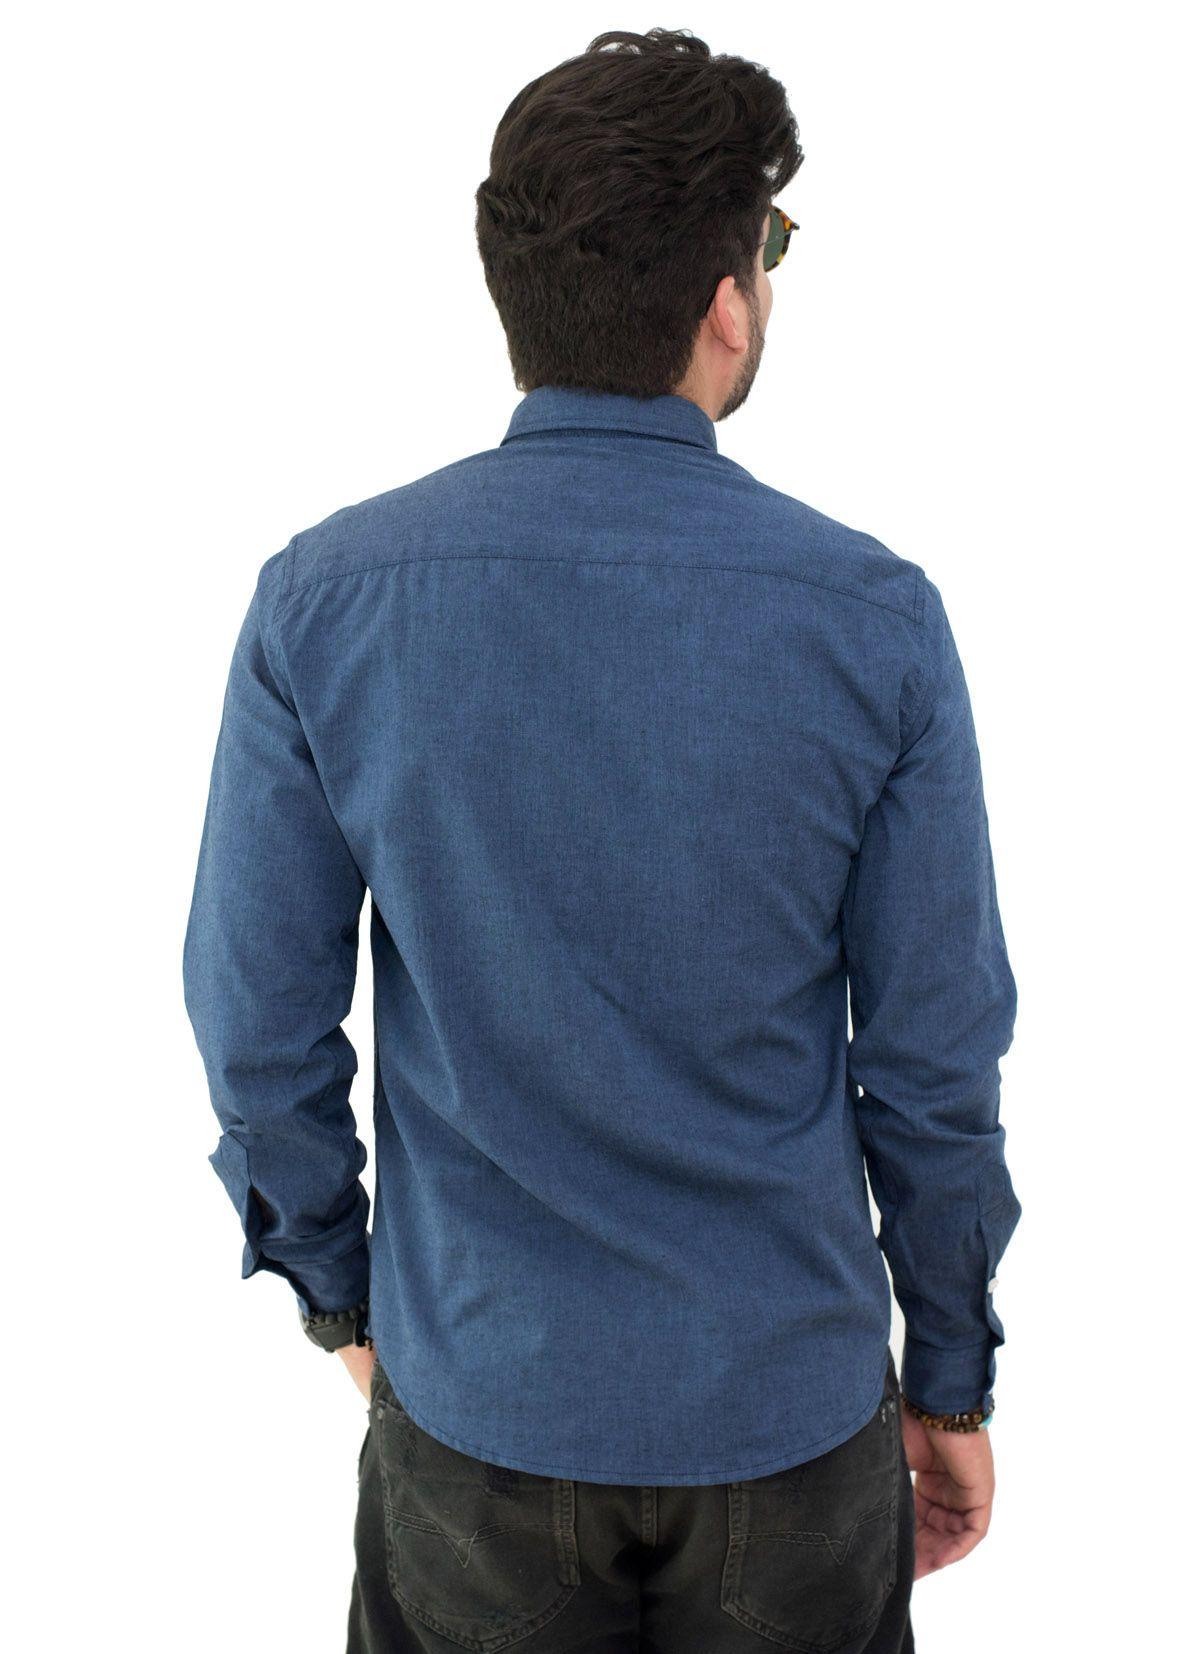 Camisa Social LCT Oxford Azul Marinho Mescla  - Ca Brasileira